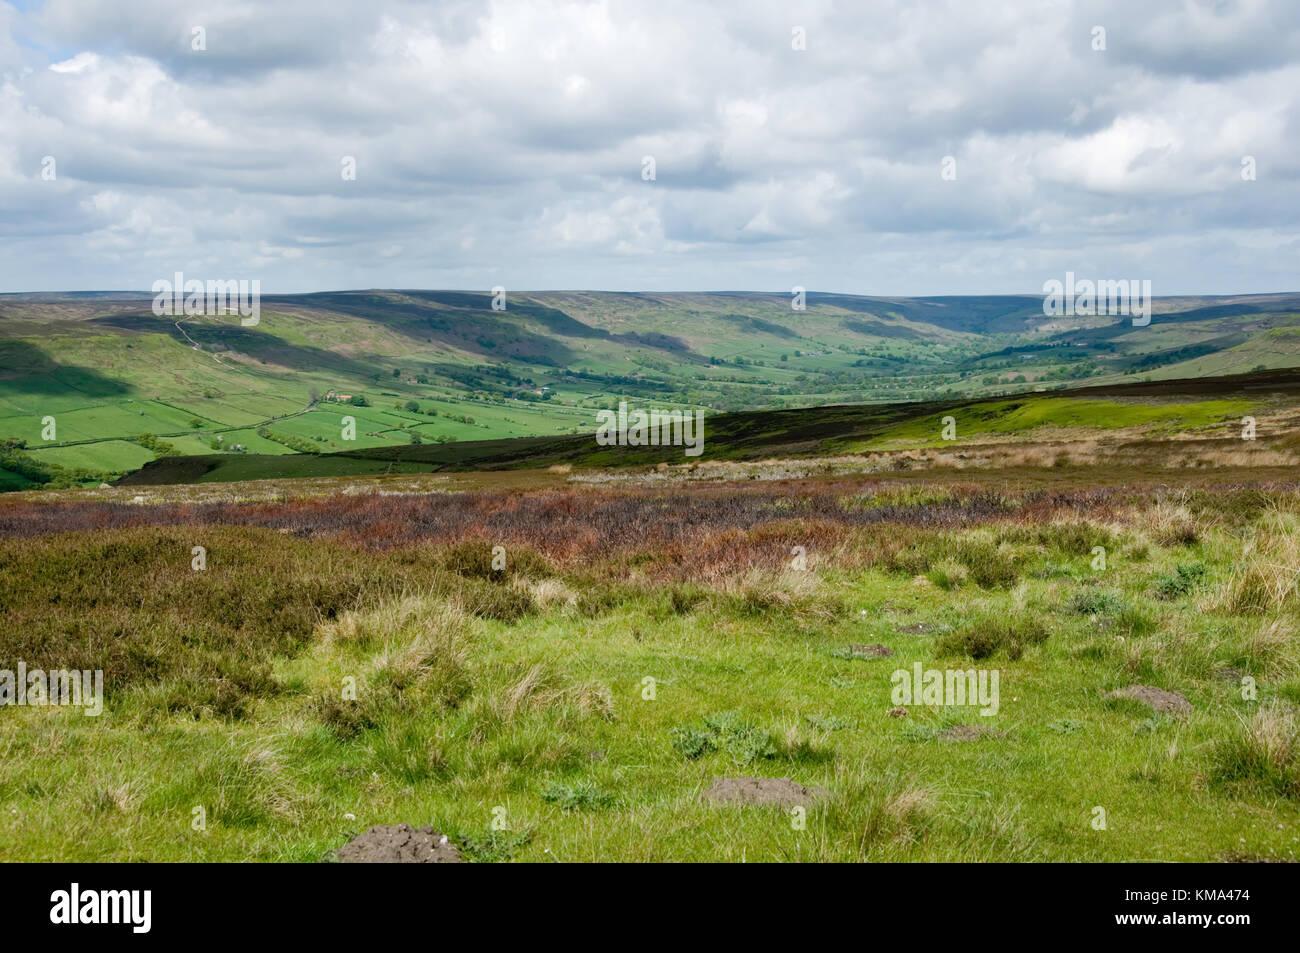 North Yorkshire Moors Wildnis Yorkshire Landschaft Heather Stockfoto